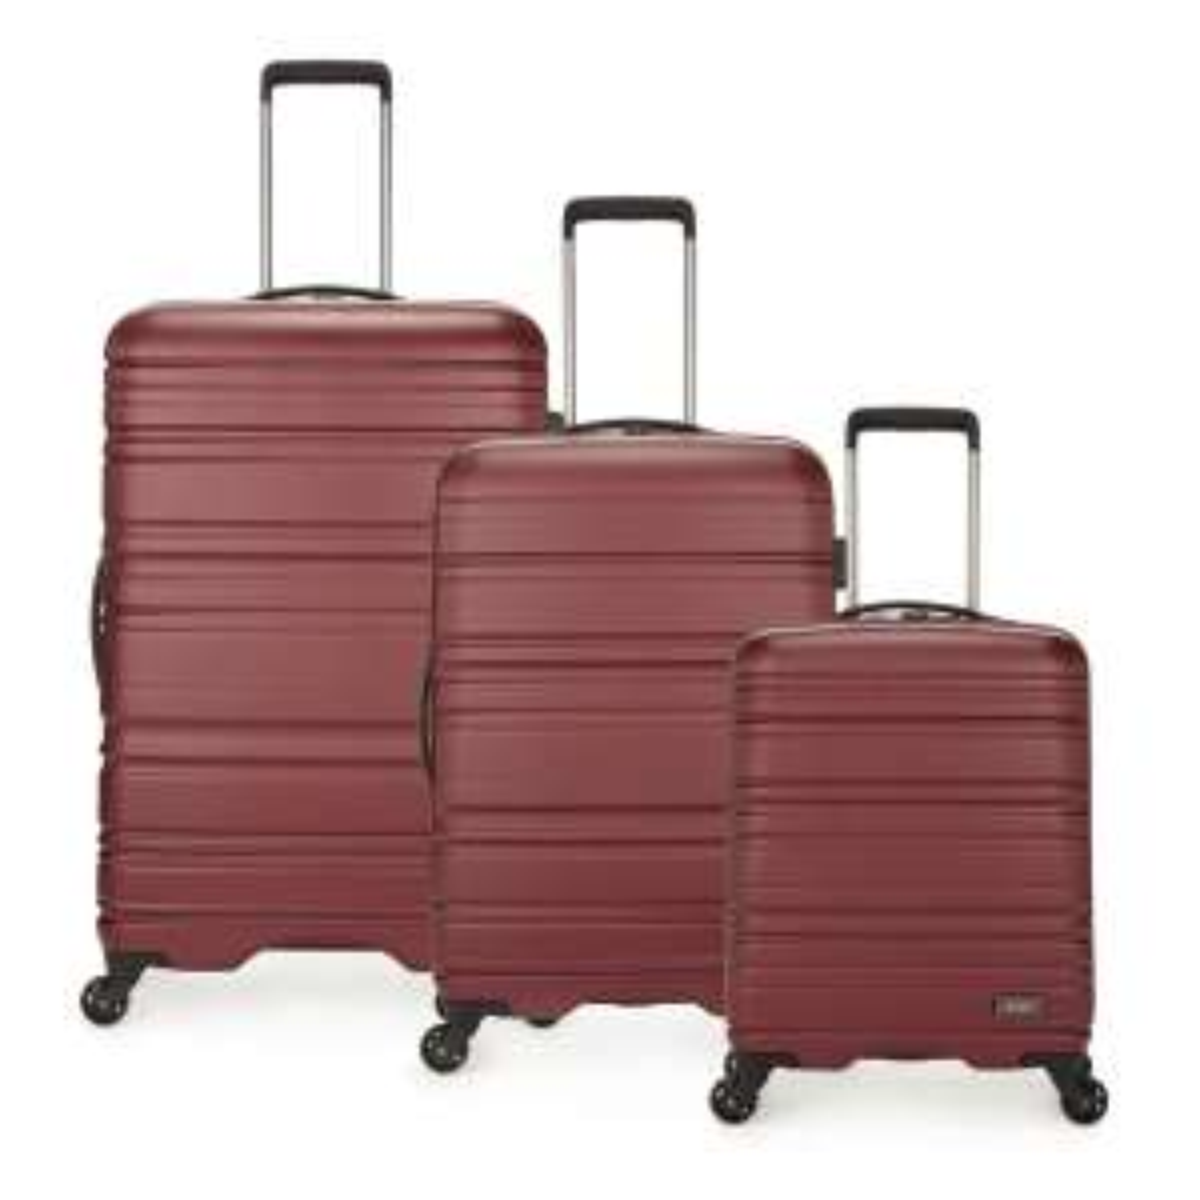 Antler Saturn 3-Piece Suitcase Set - Burgundy £149.99 + Free delivery @ Robert Dyas